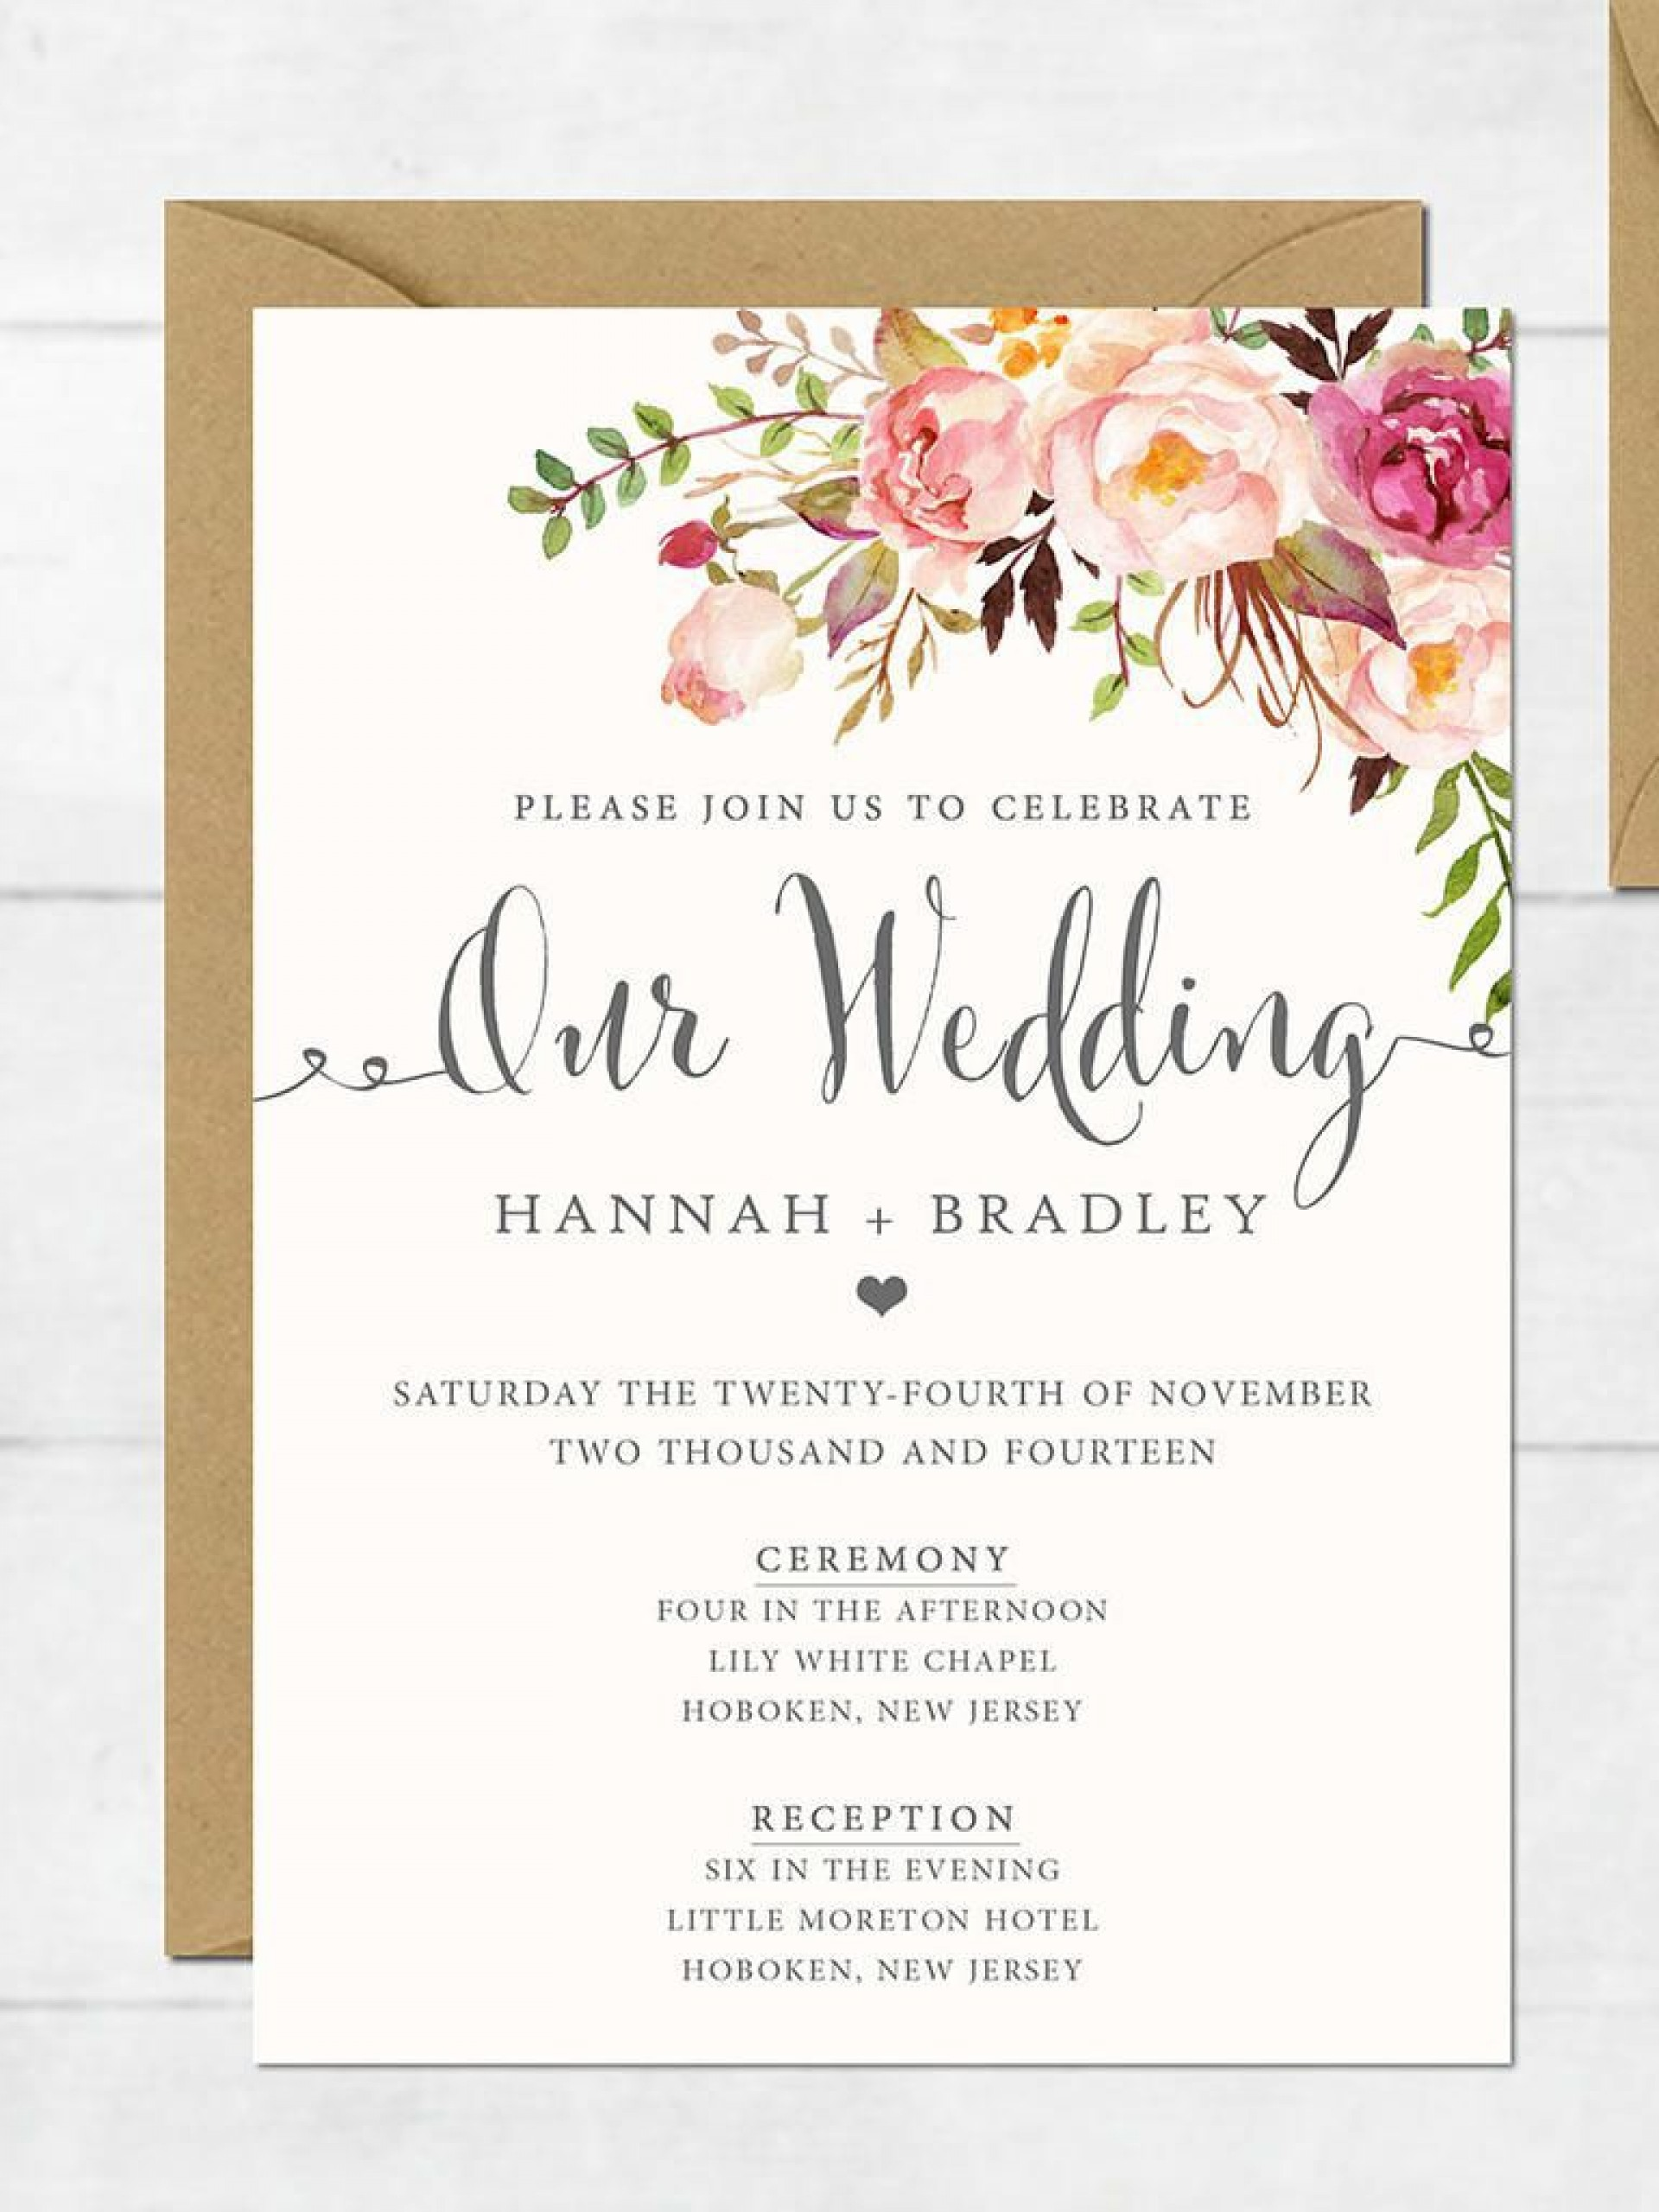 004 Shocking Sample Wedding Invitation Template Free Download High Resolution  Wording1920